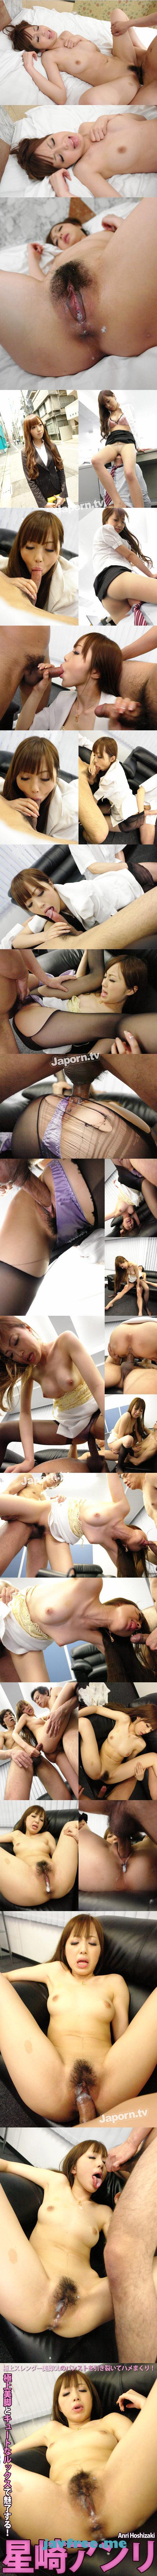 [HEY 010] 極上スレンダー美脚OLのパンストを引き裂いてハメまくり! : 星崎アンリ 星崎アンリ HEY Anri Hoshizaki